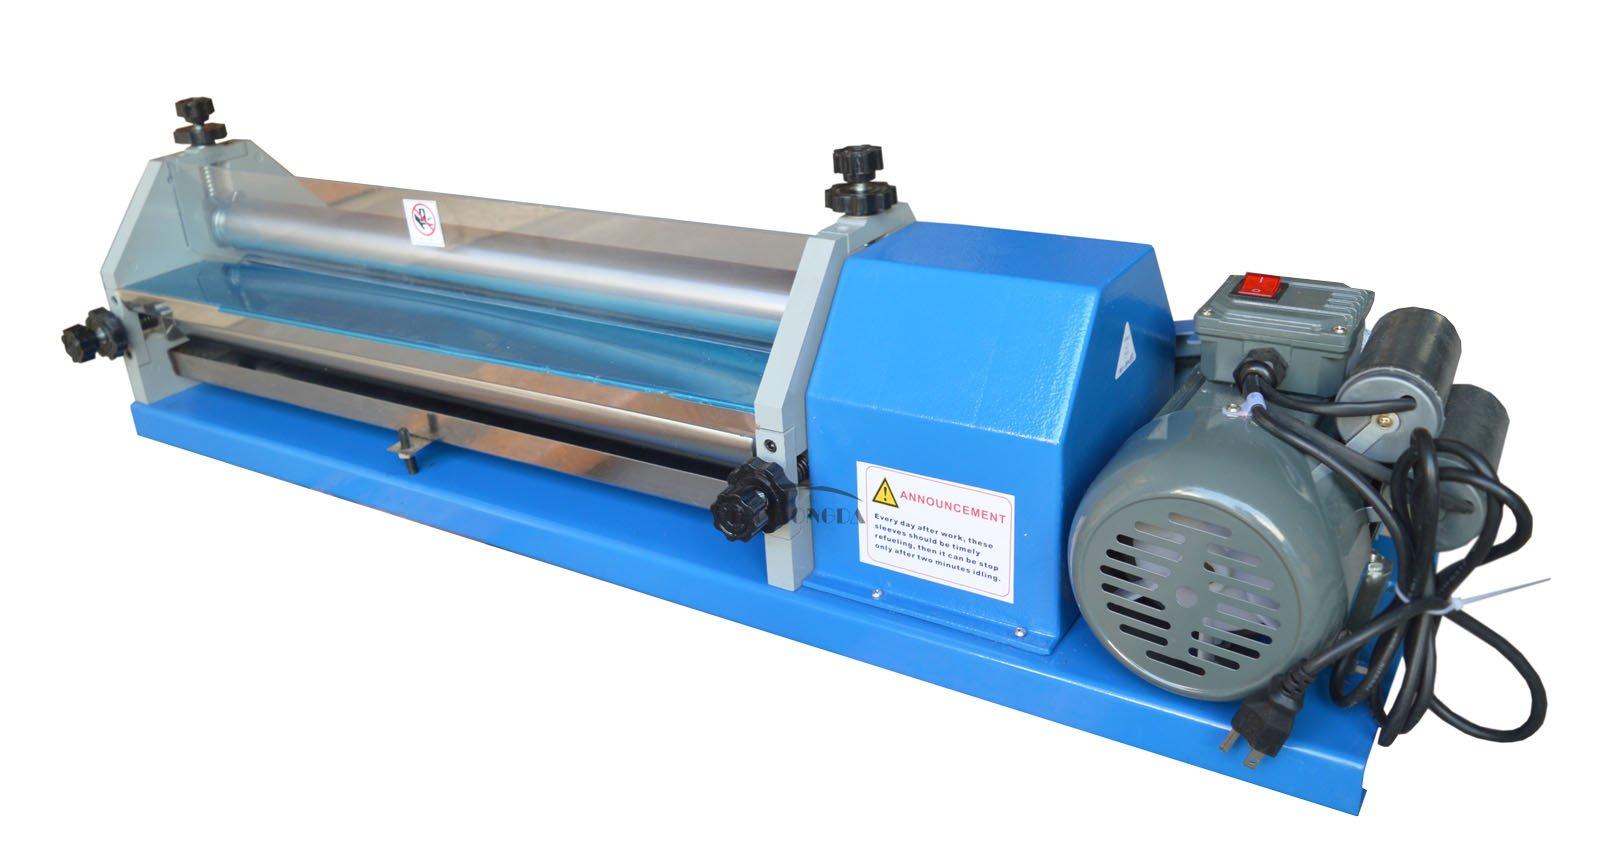 23In 110V White Emulsion Gluing Coating Machine for Paper Leather Cardboard Coater